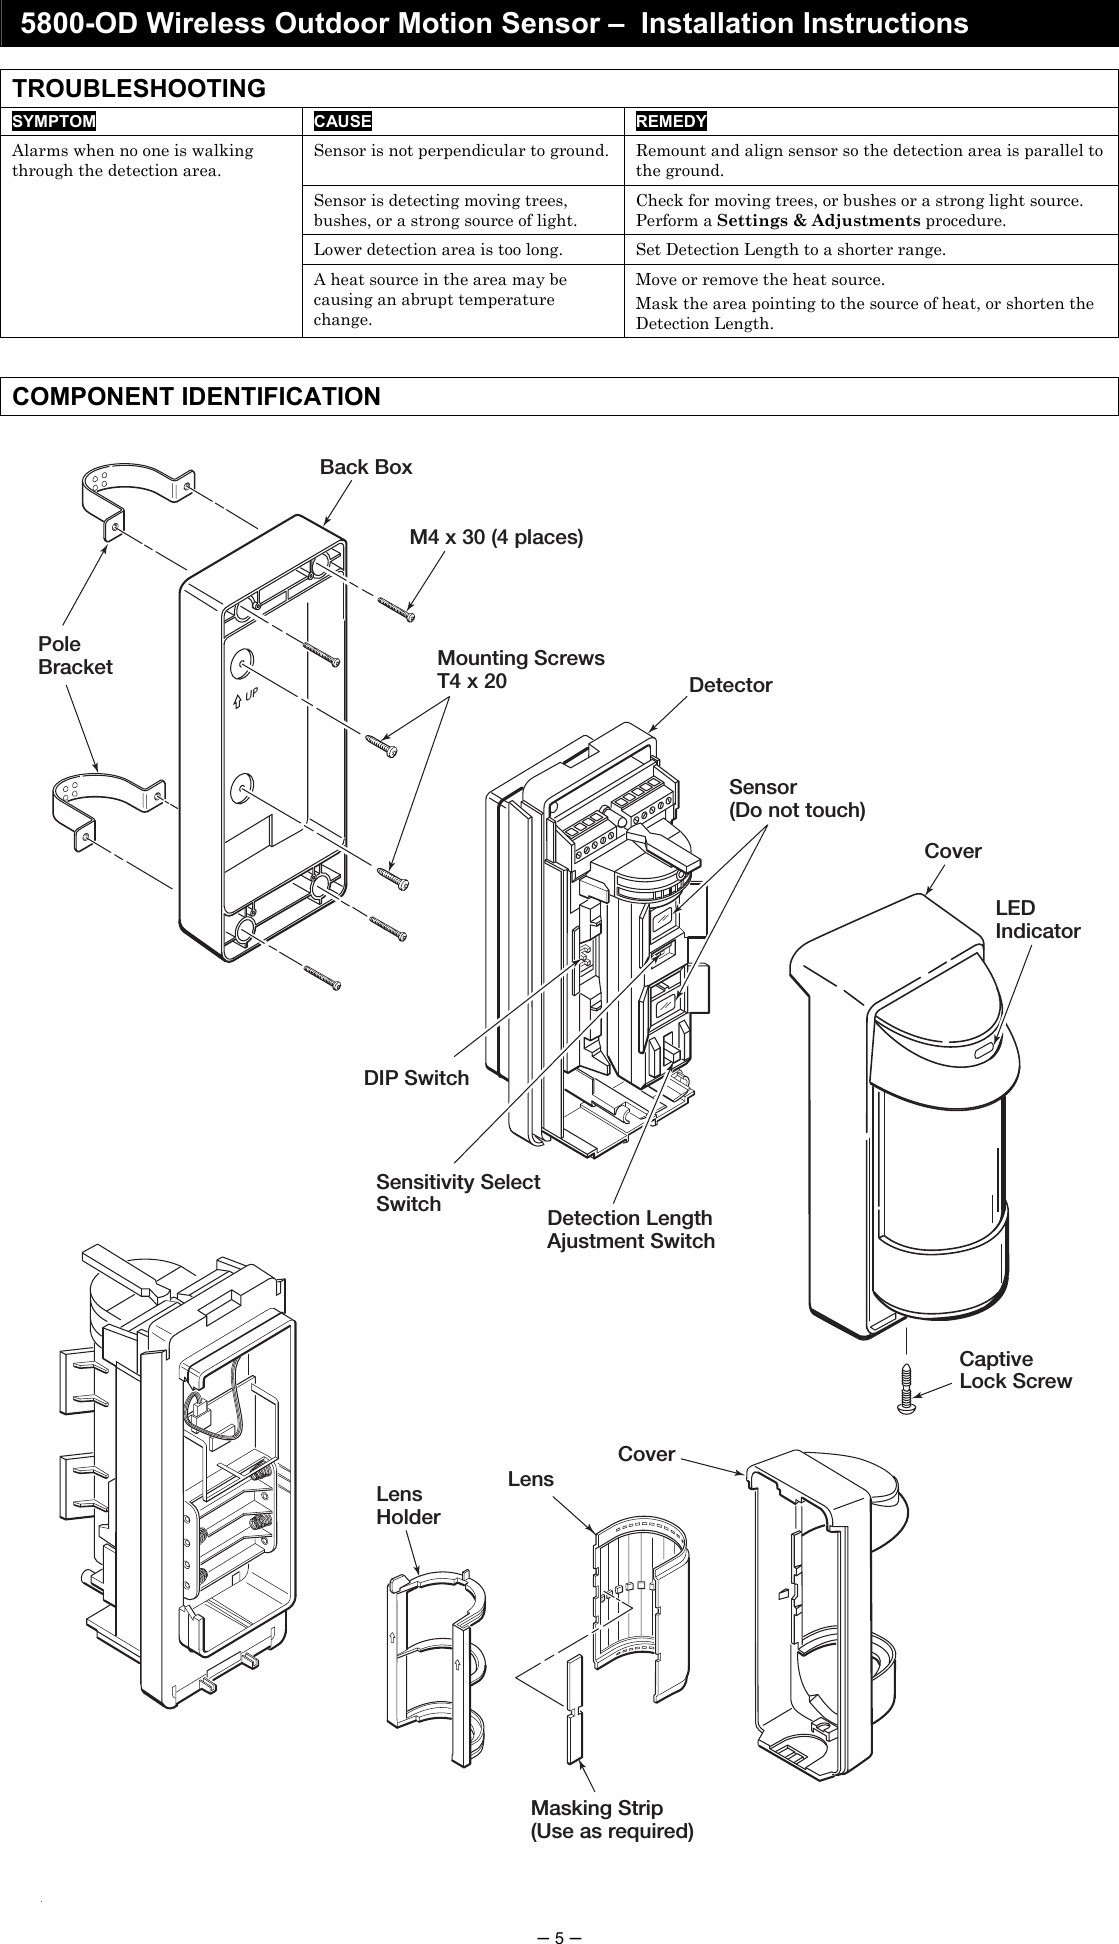 Car Alarm Installation Wiring Diagram Automotive Wire Diagram Luxury Honeywell Alarm Wiring Diagram Of Car Alarm Installation Wiring Diagram